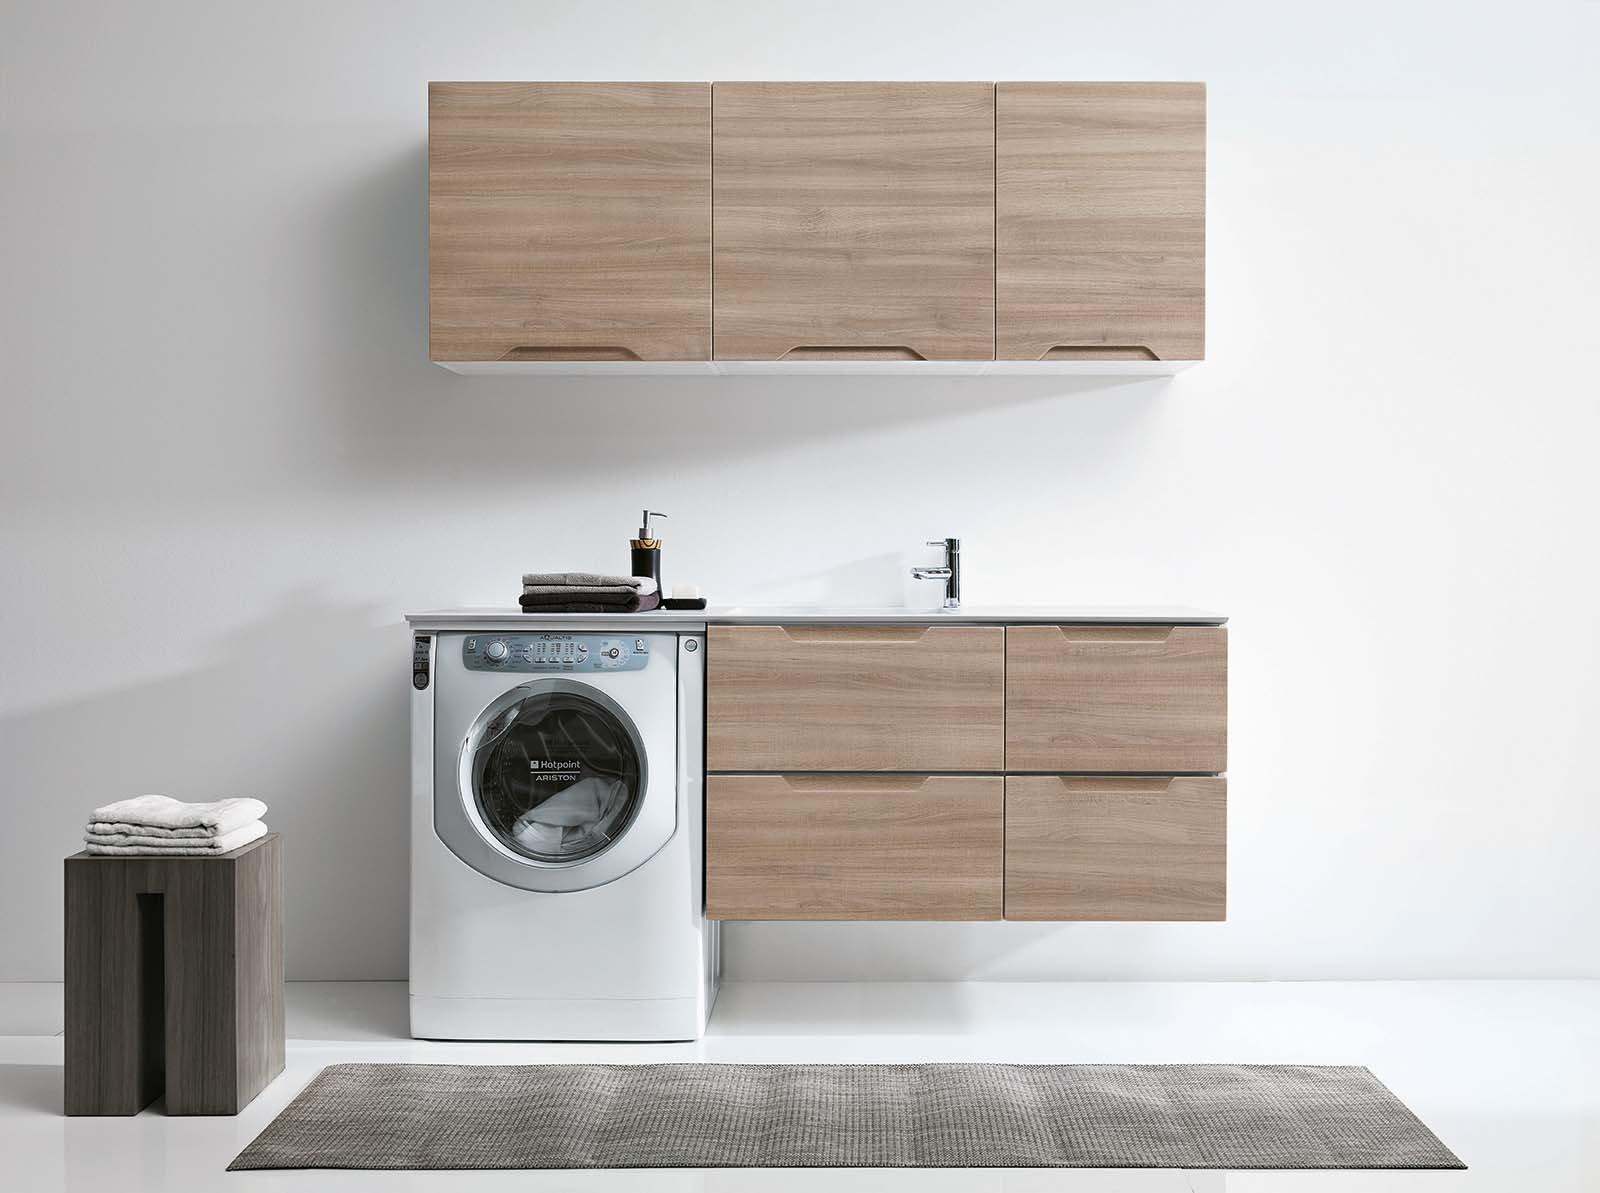 Colonna lavatrice asciugatrice ikea wa81 regardsdefemmes - Lavatrice per piumoni ...